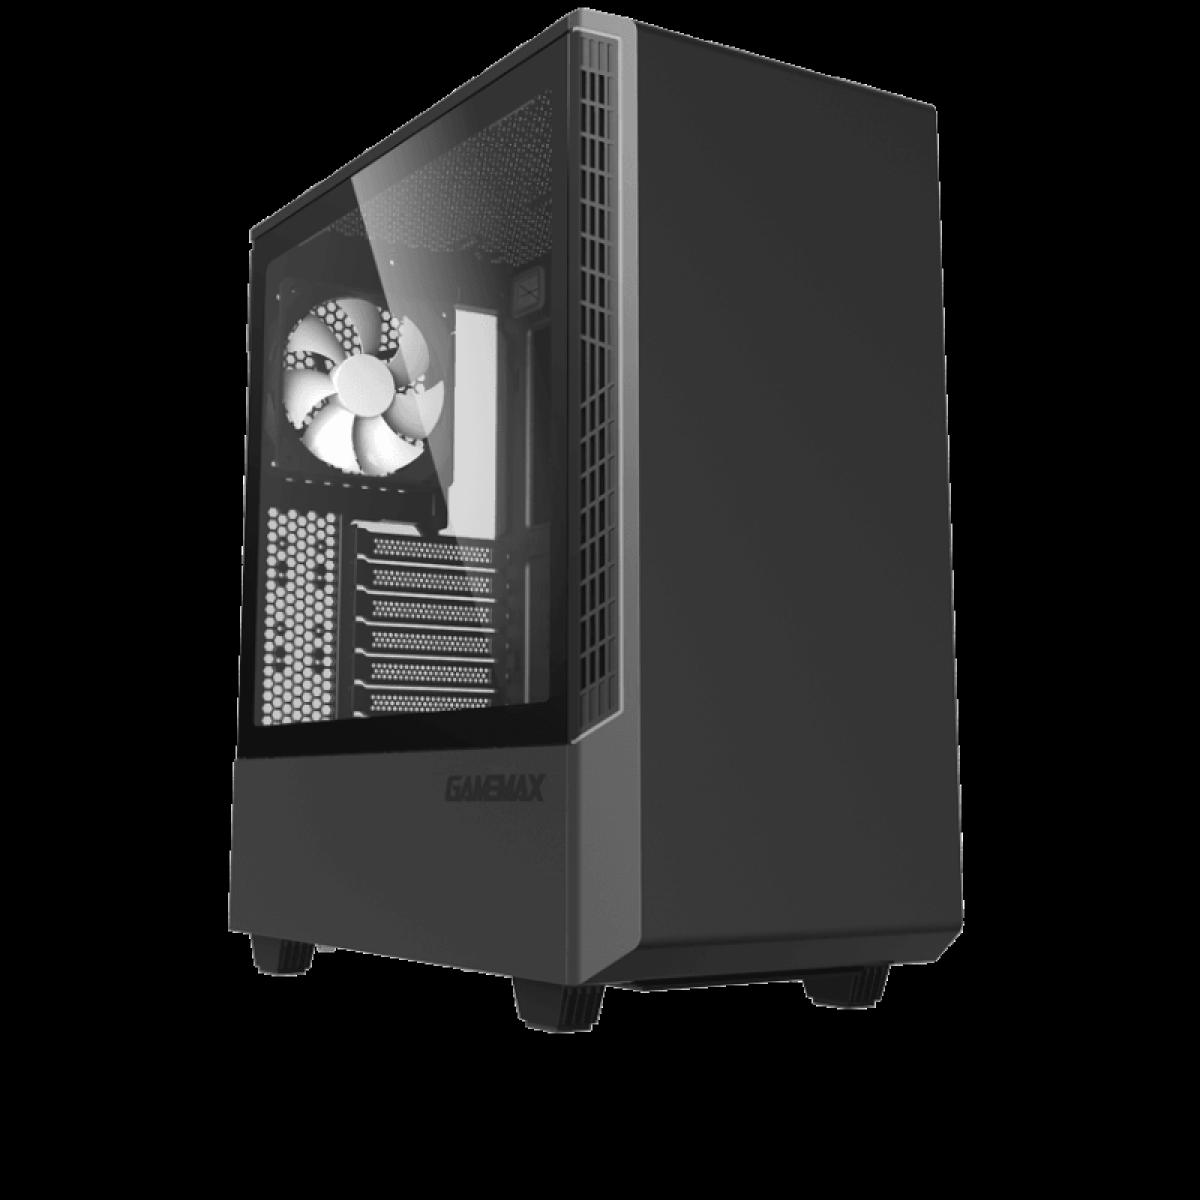 Gabinete Gamer Gamemax Panda,  Mid Tower, Vidro Temperado, Preto, S-Fonte, Com 1 Fan